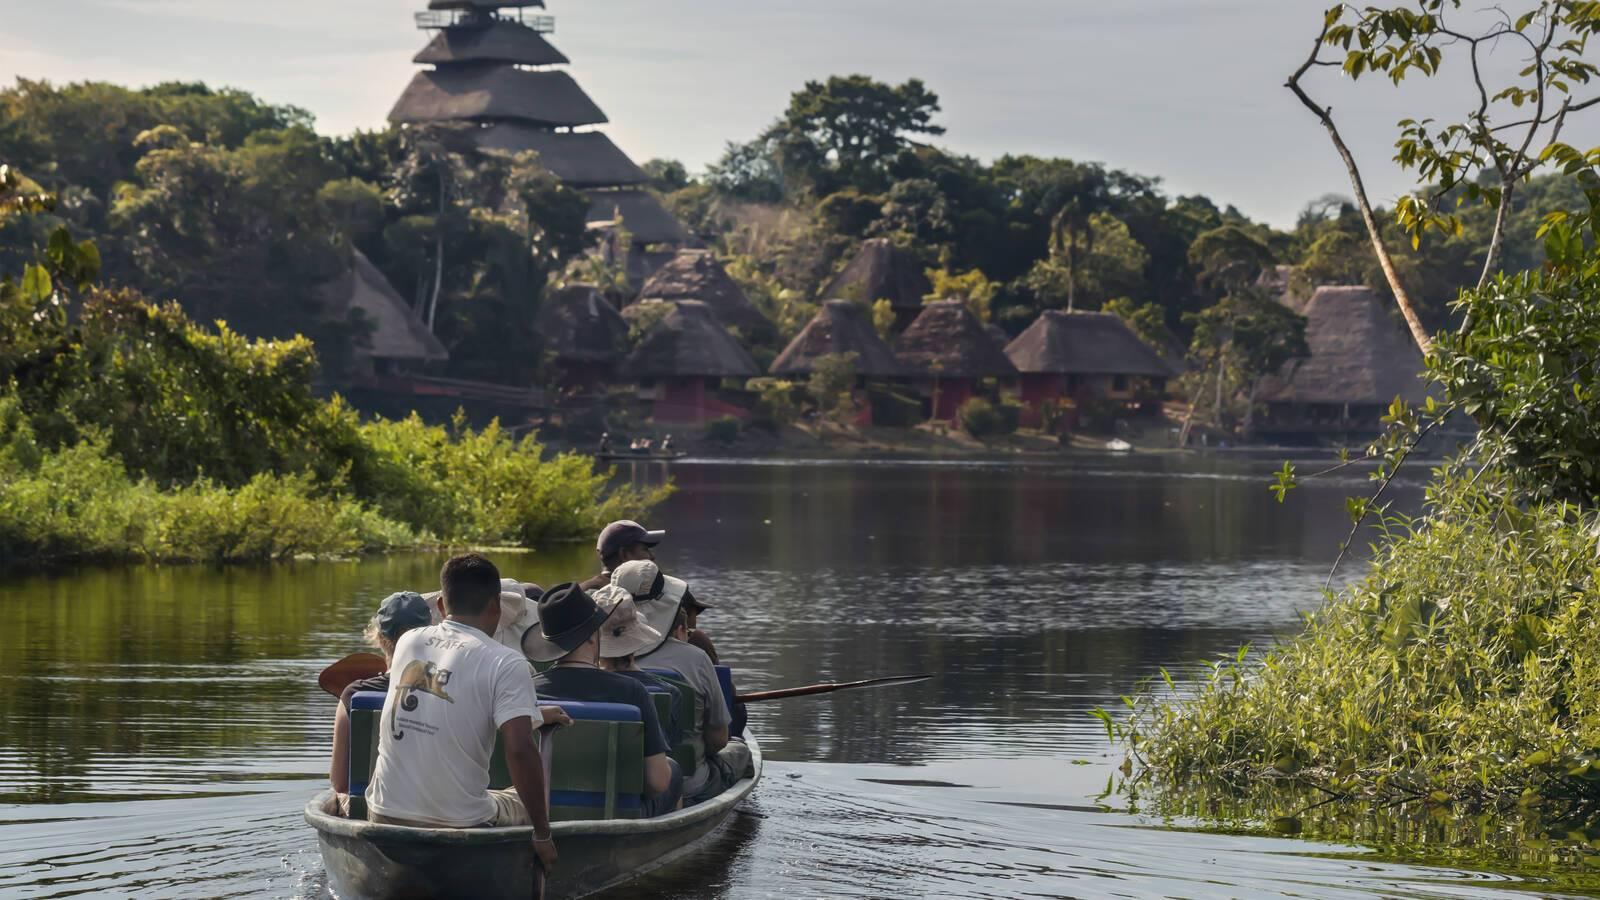 Napo Wildlife Center Pirogue Equateur